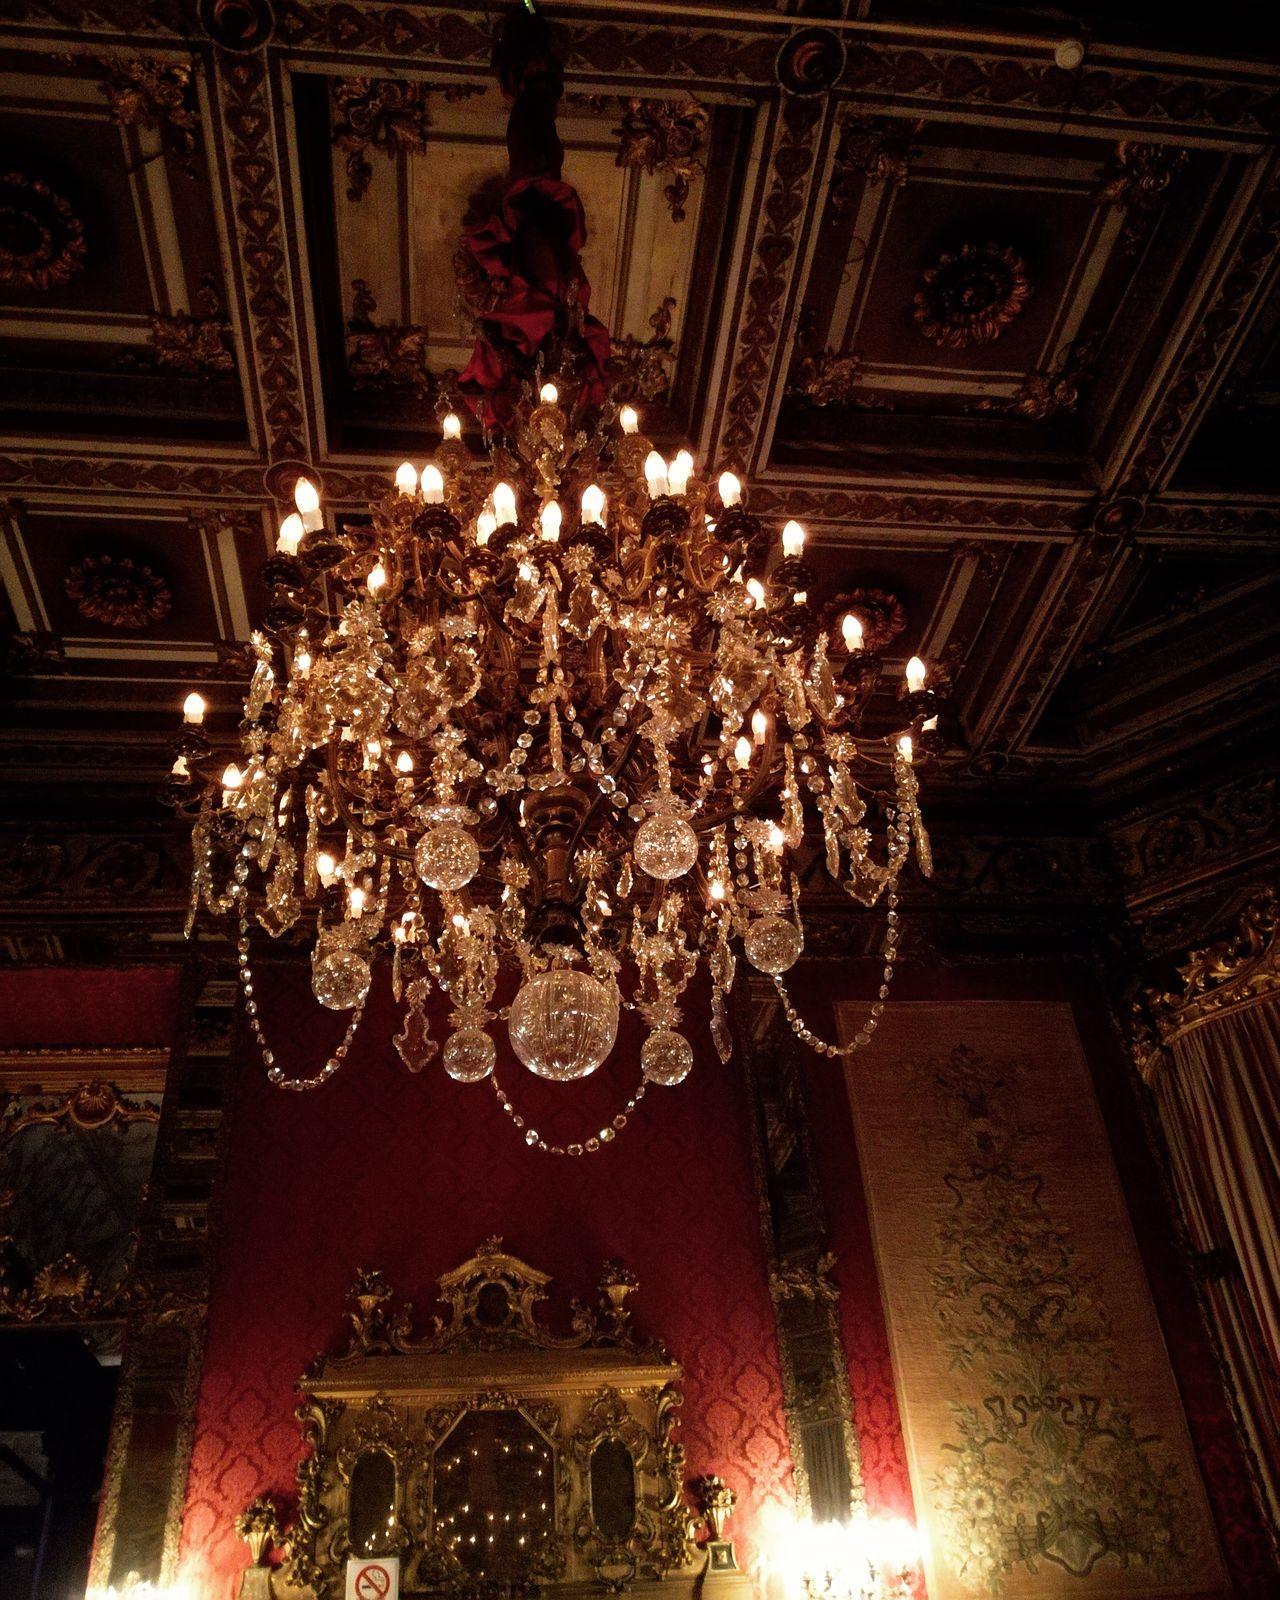 Decoration Lighting Equipment Chandelier Illuminated Luxury Indoors  Architecture Night